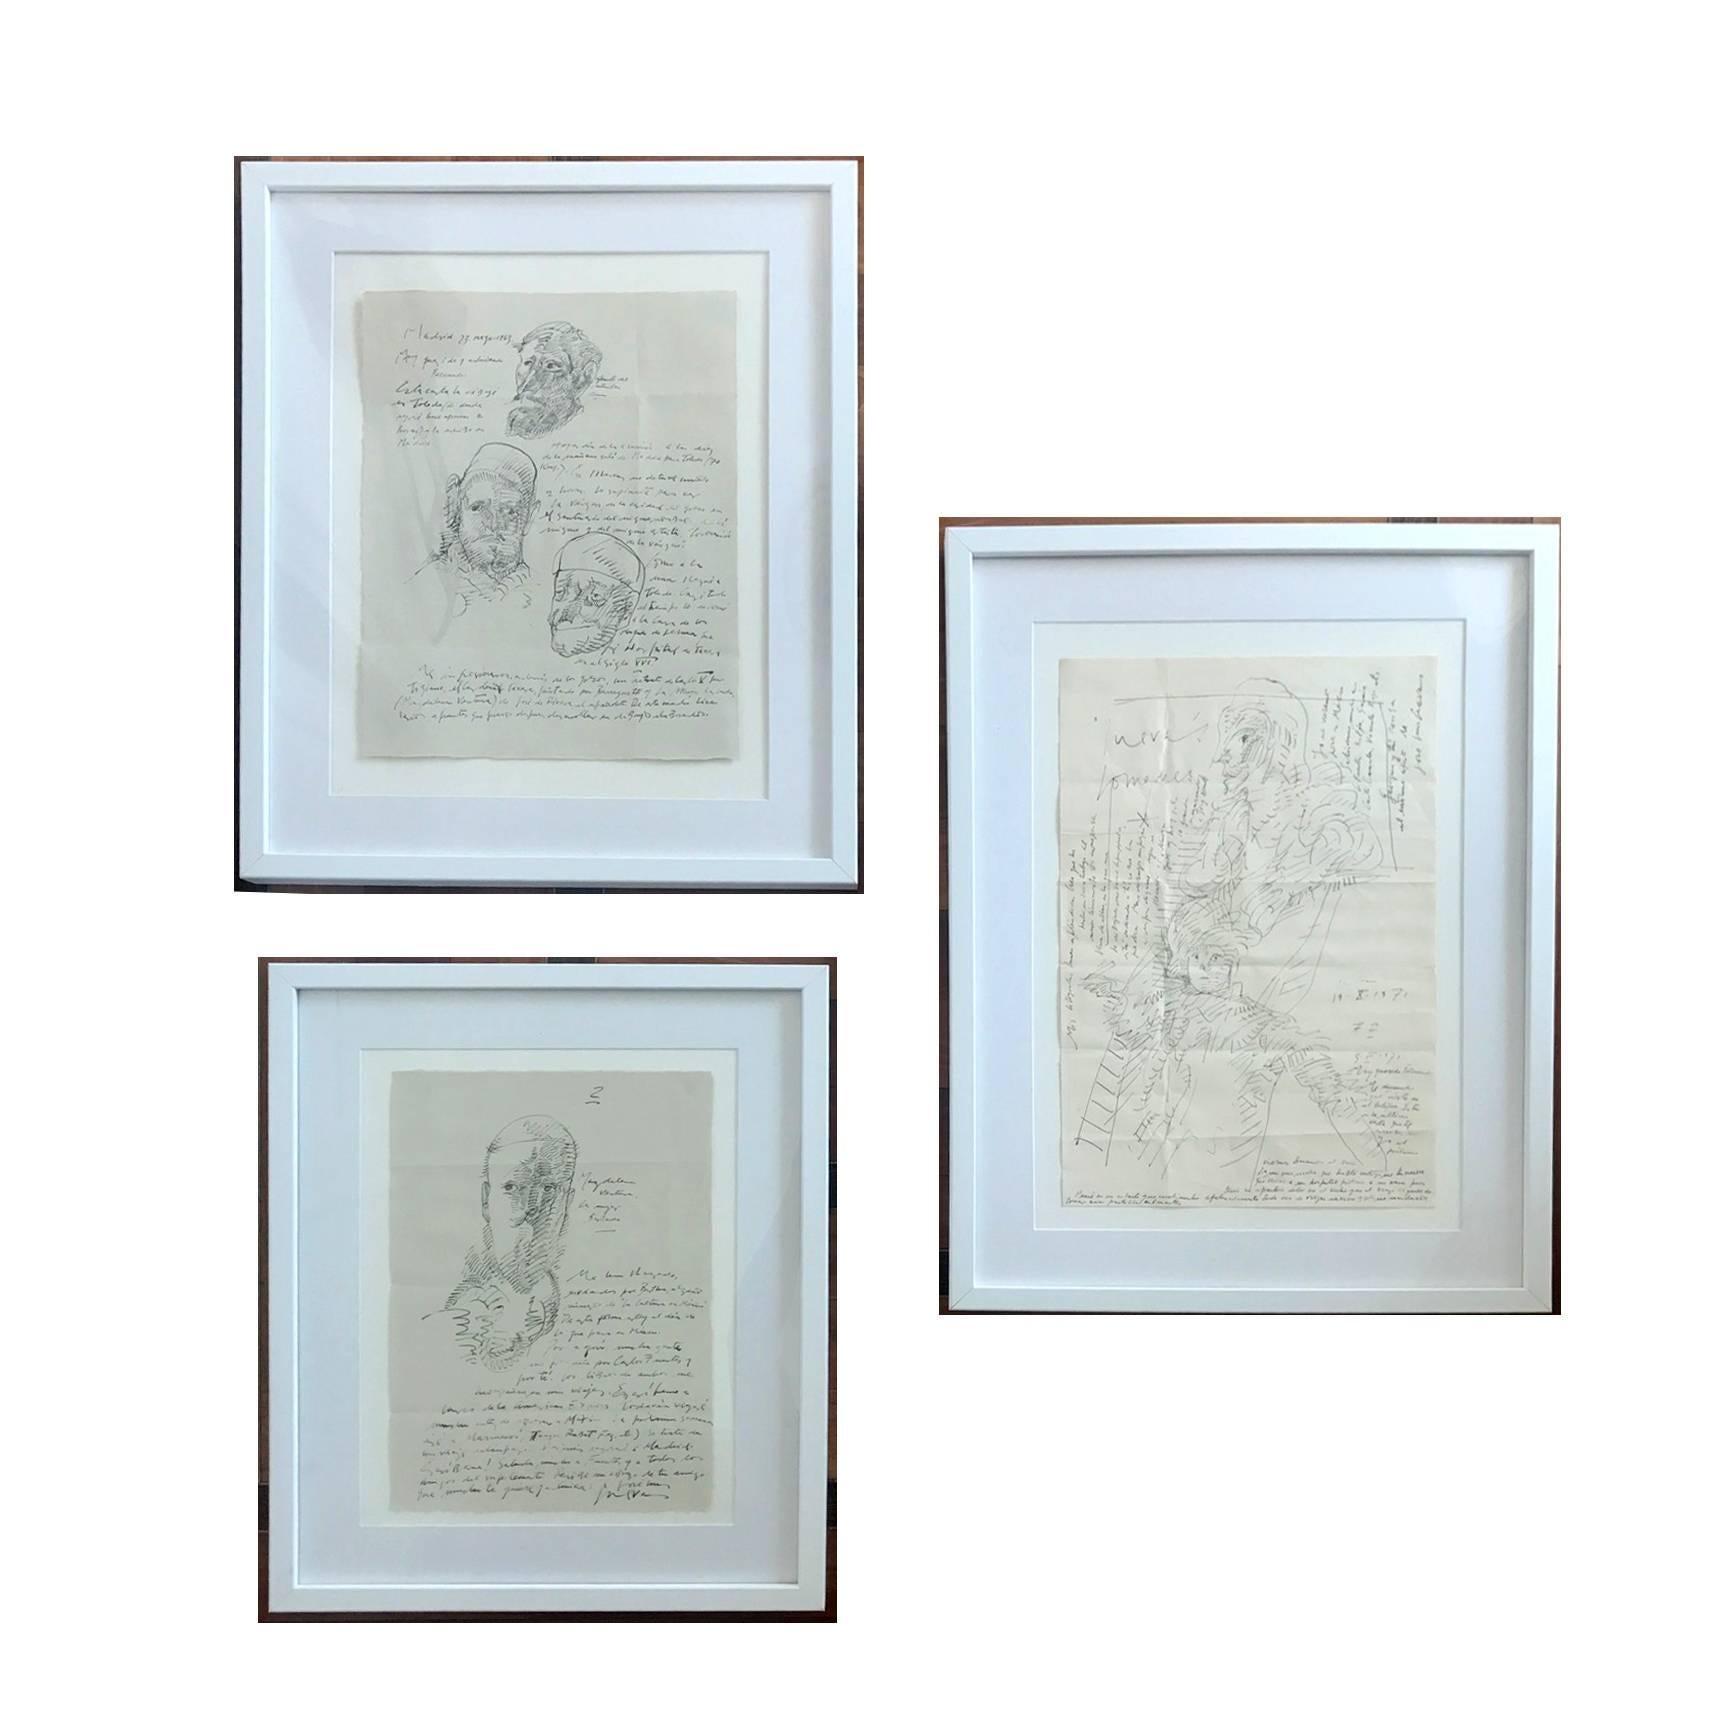 Group of Three Works on Paper by Jose Luis Cuevas, framed